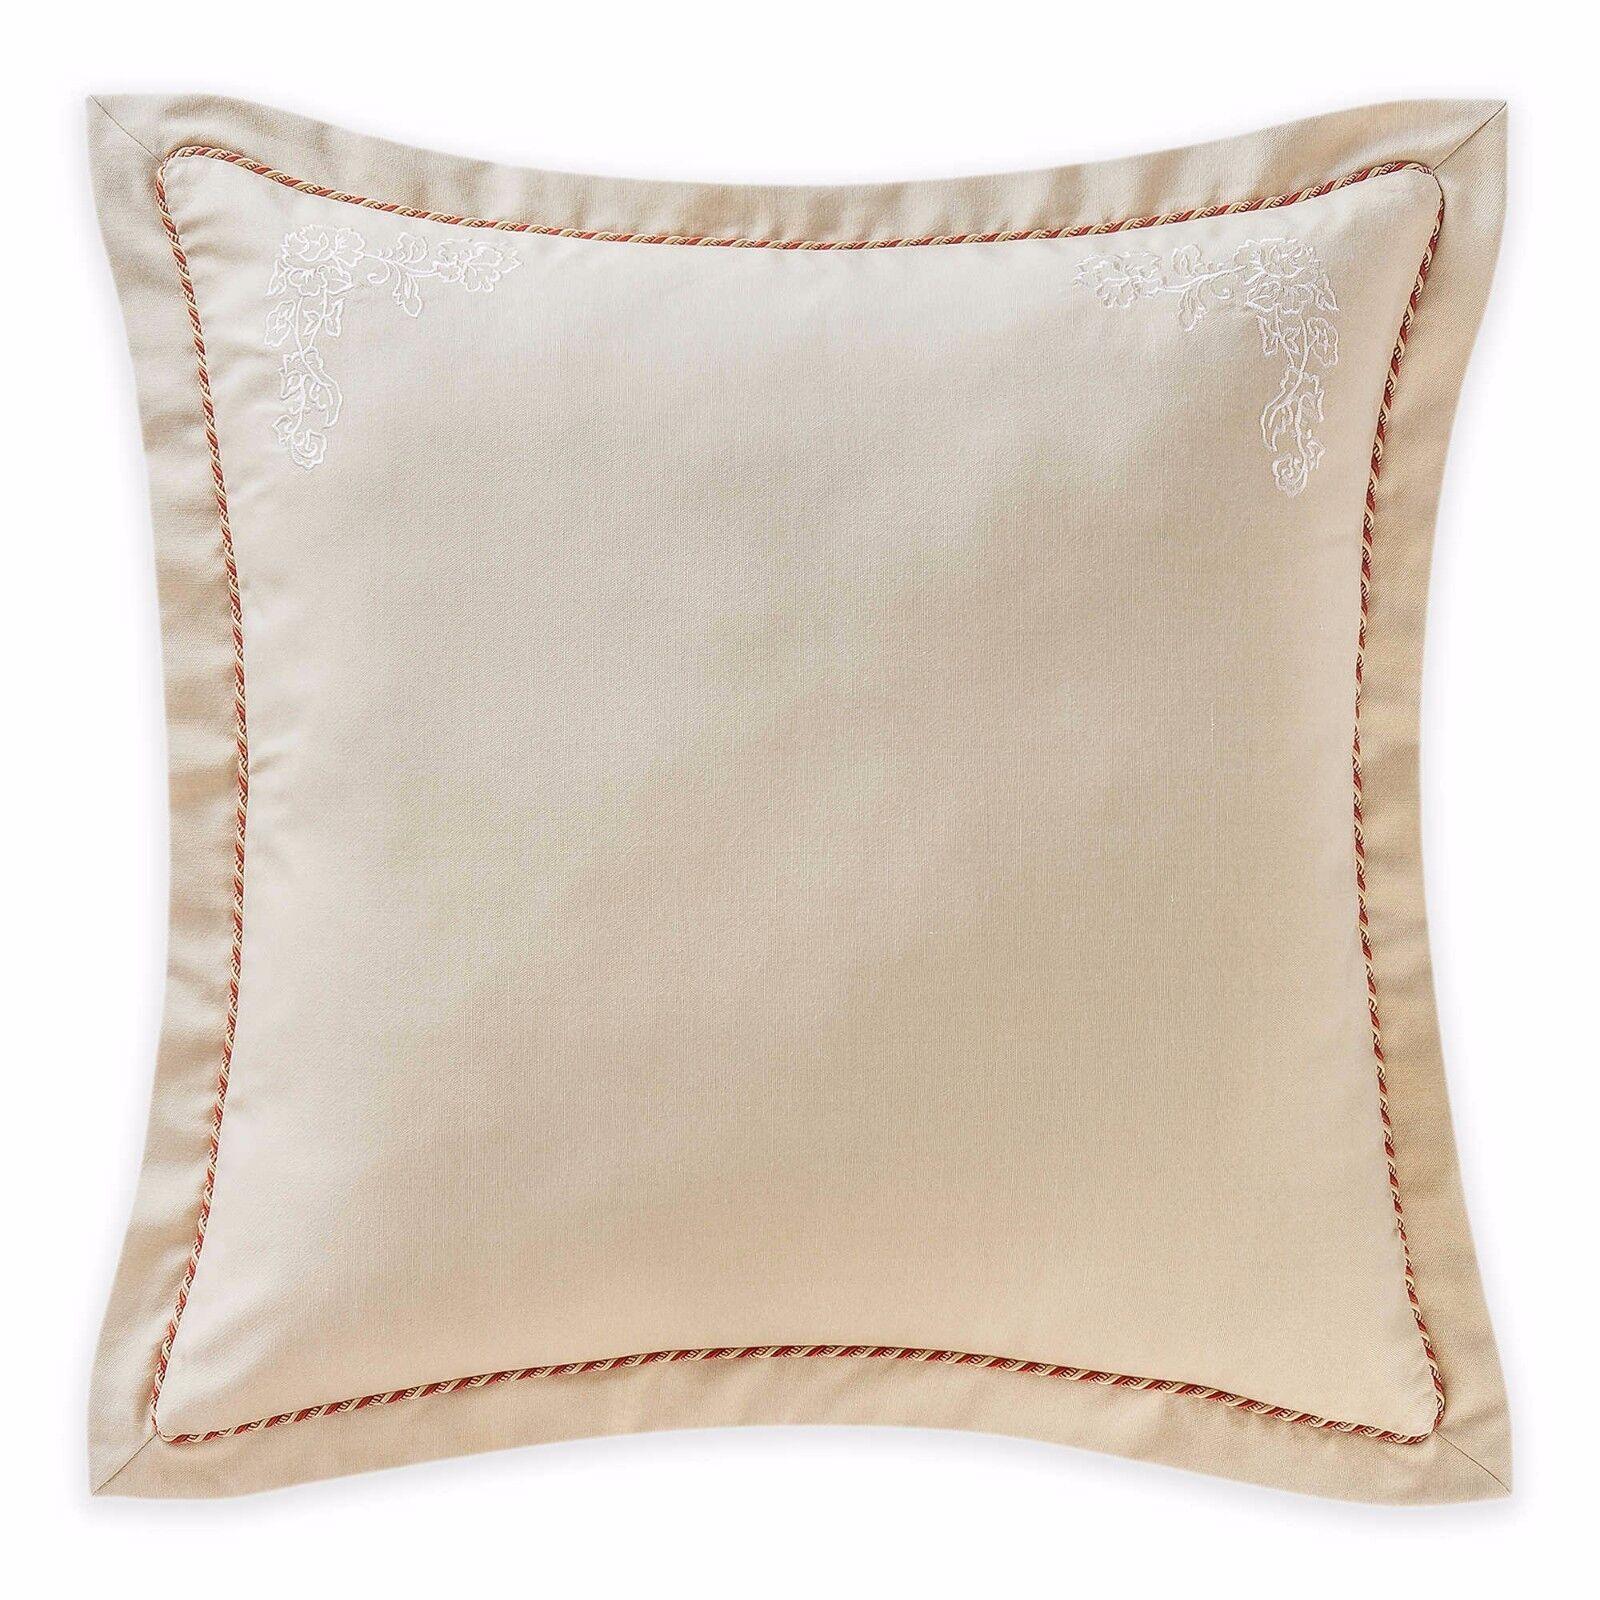 Waterford Linens Cathryn European Pillow Sham in Linen 26 X 26 New